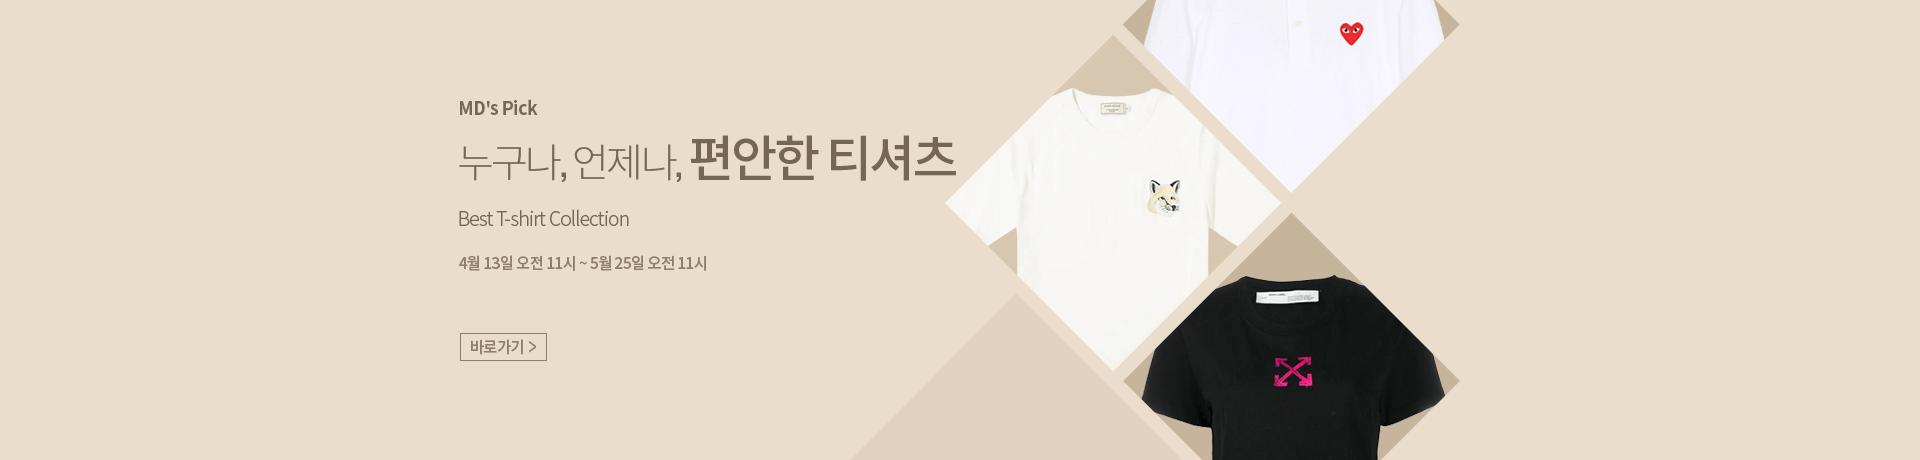 200413_sy_t-shirt_pc-_ebddcb